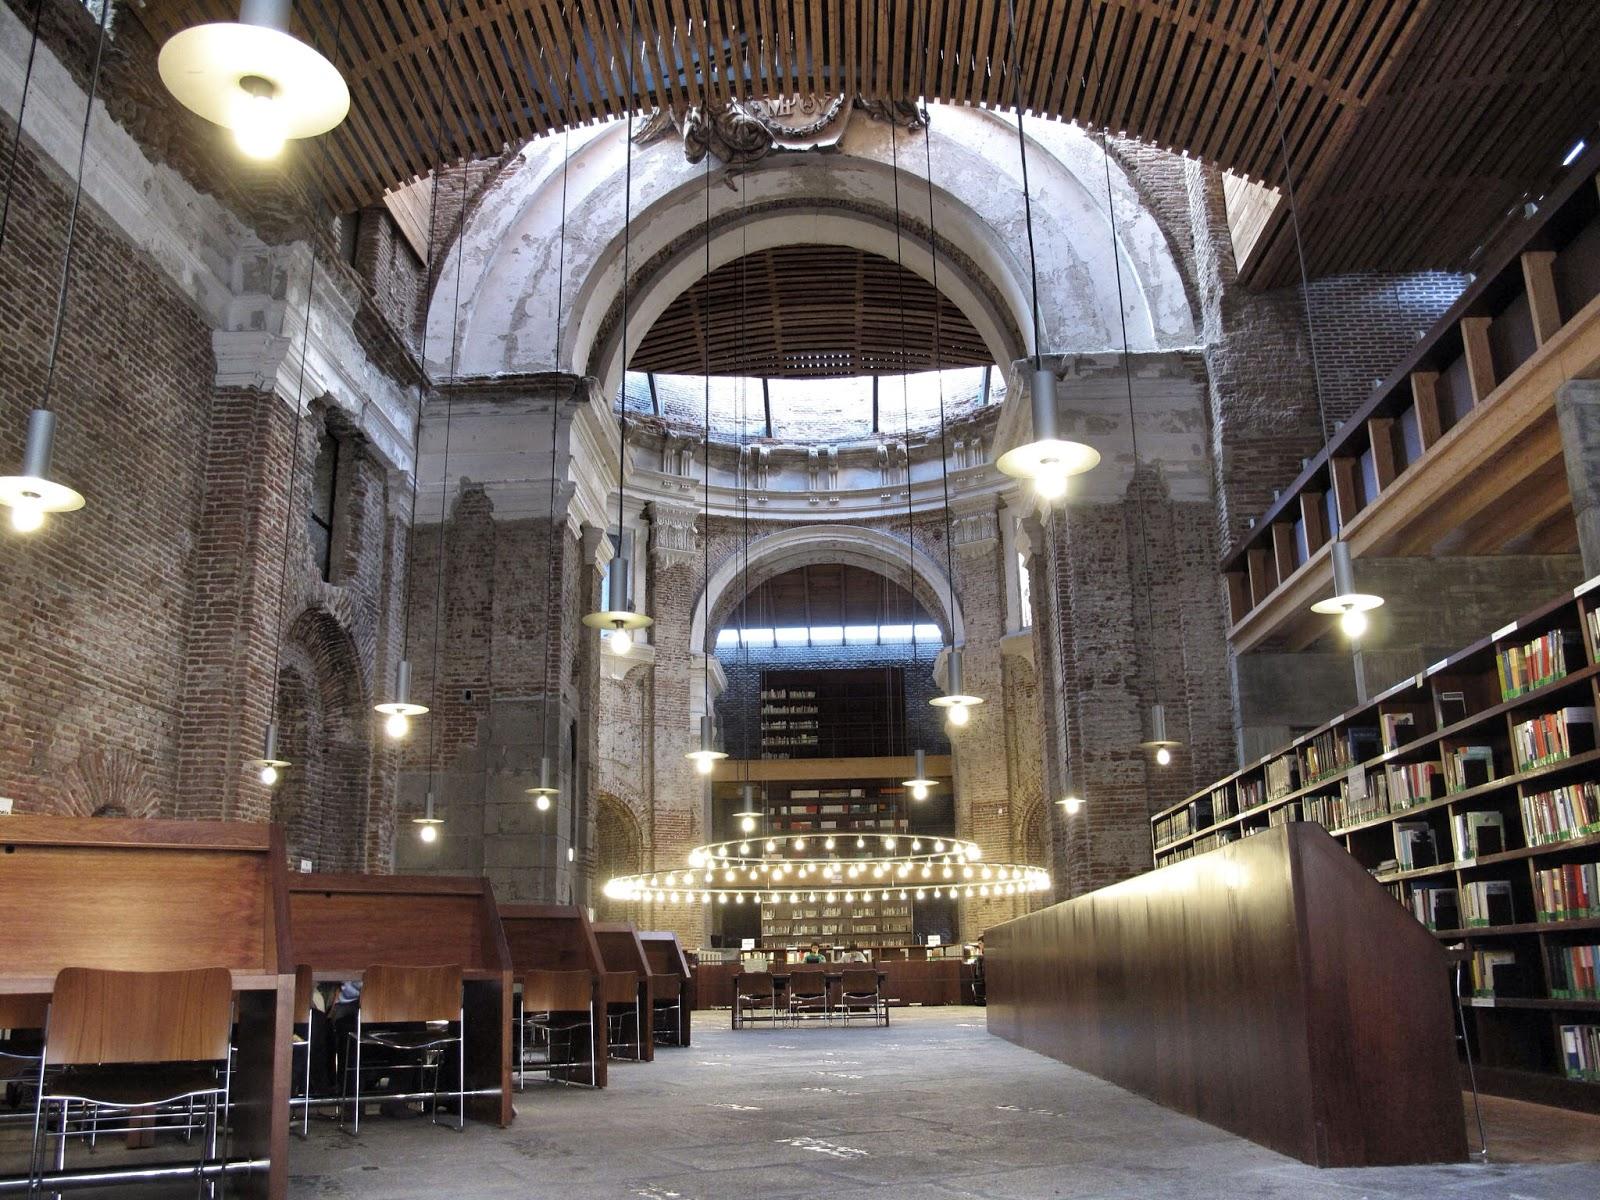 Viviendo del cuento dentro de la biblioteca for Biblioteca iglesia madrid